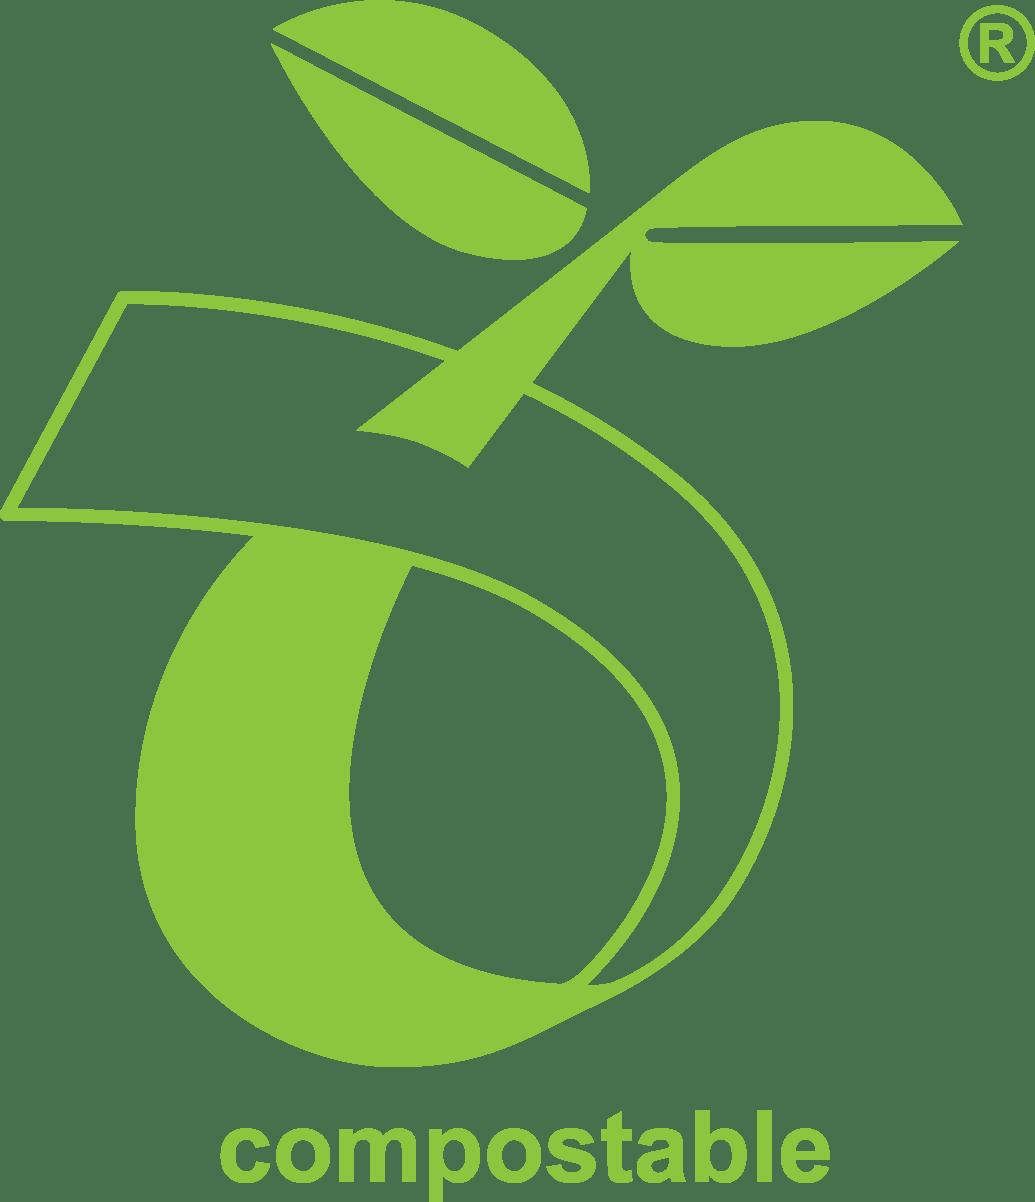 Charte environnement 5